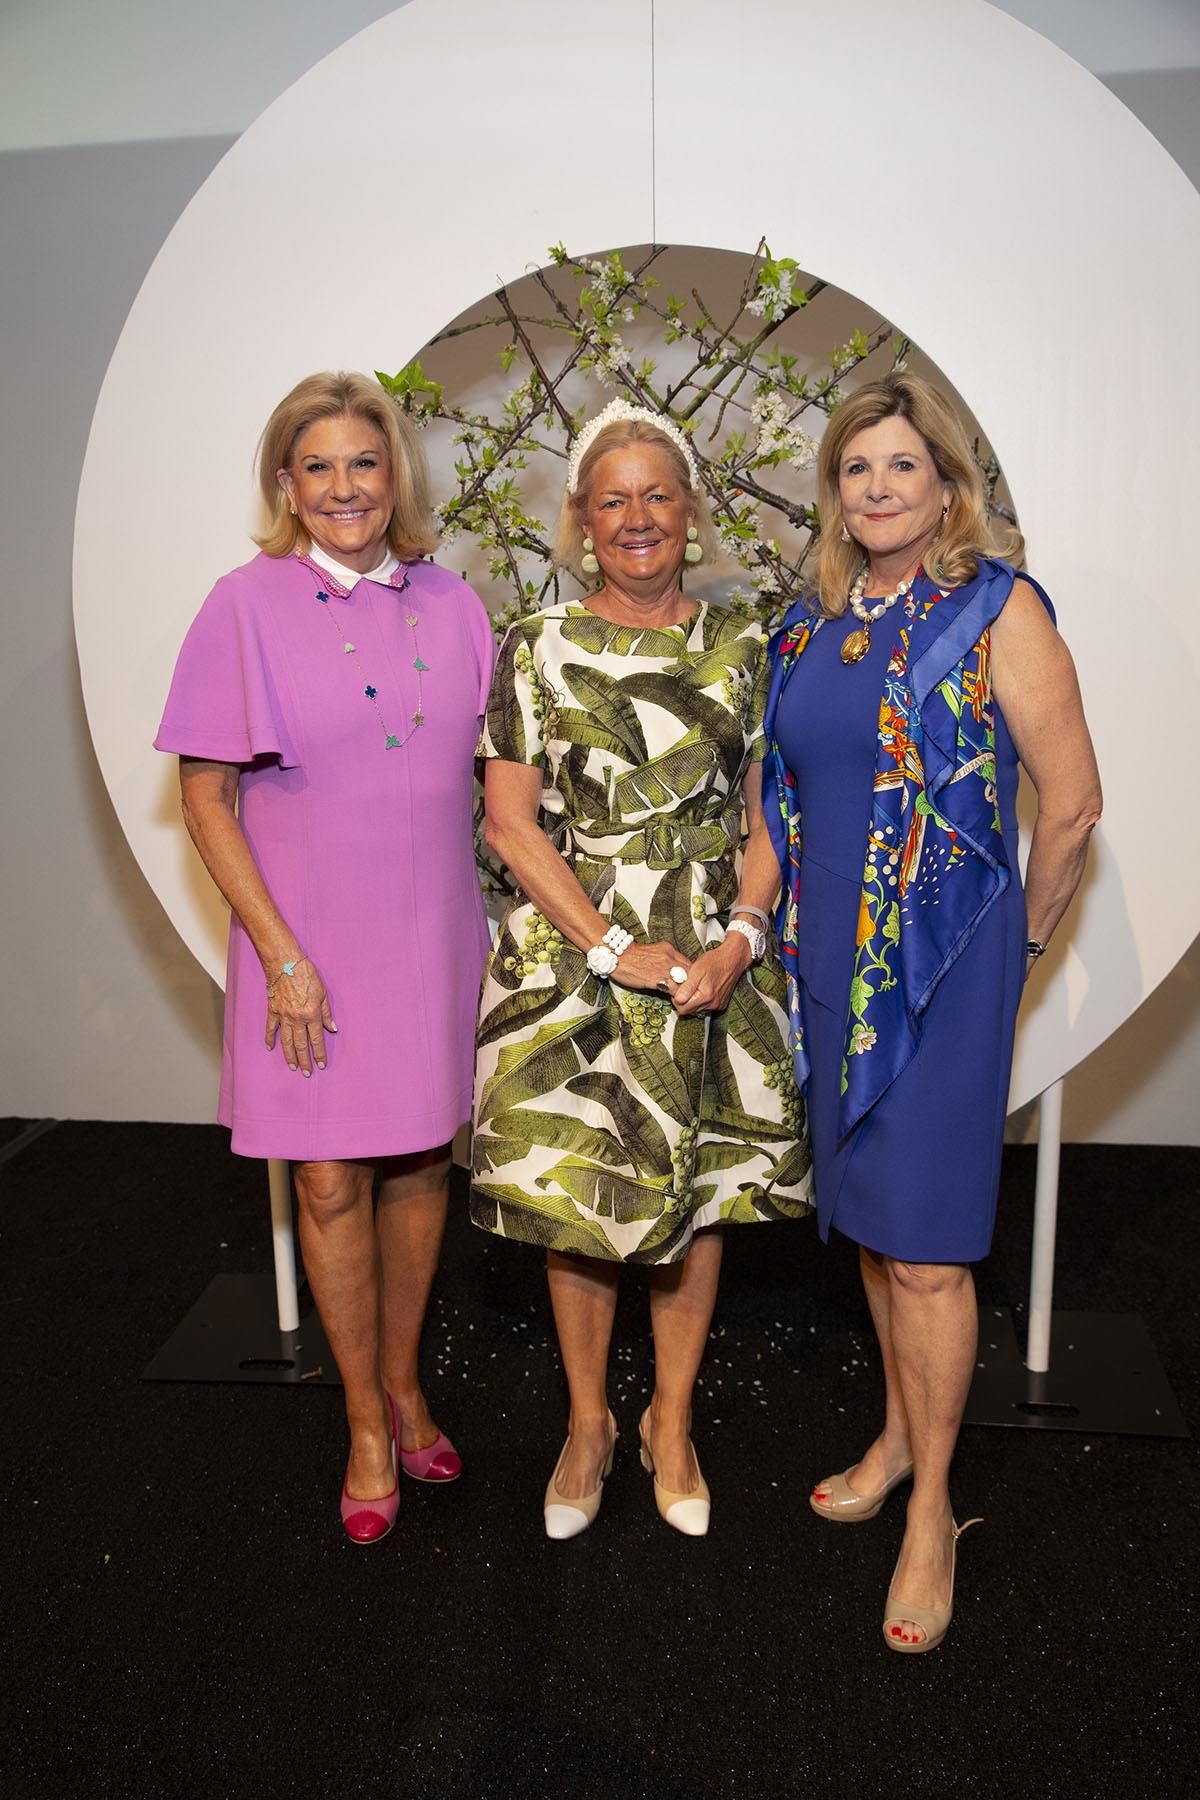 Rosanna Blalock, Kit Detering and Gretchen Lahourcade